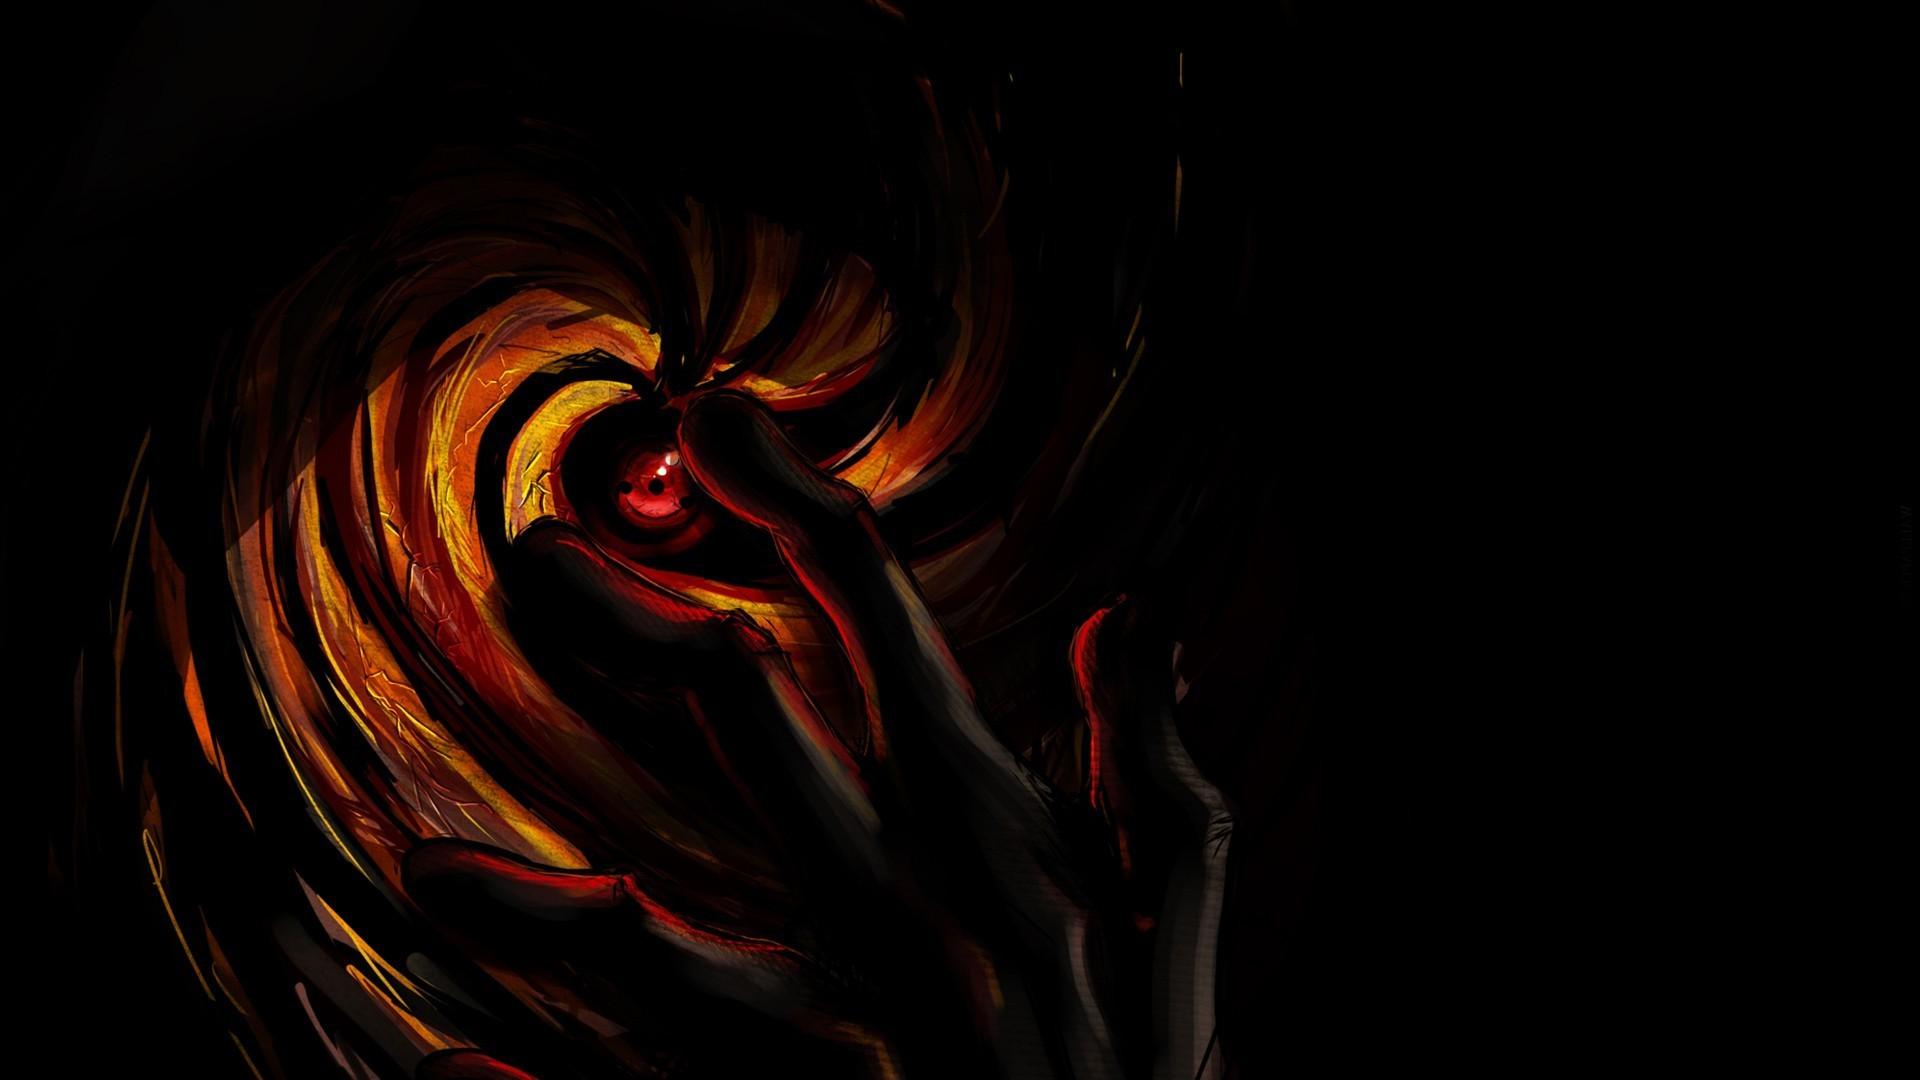 Obito Uchiha   Naruto wallpaper 14512 1920x1080